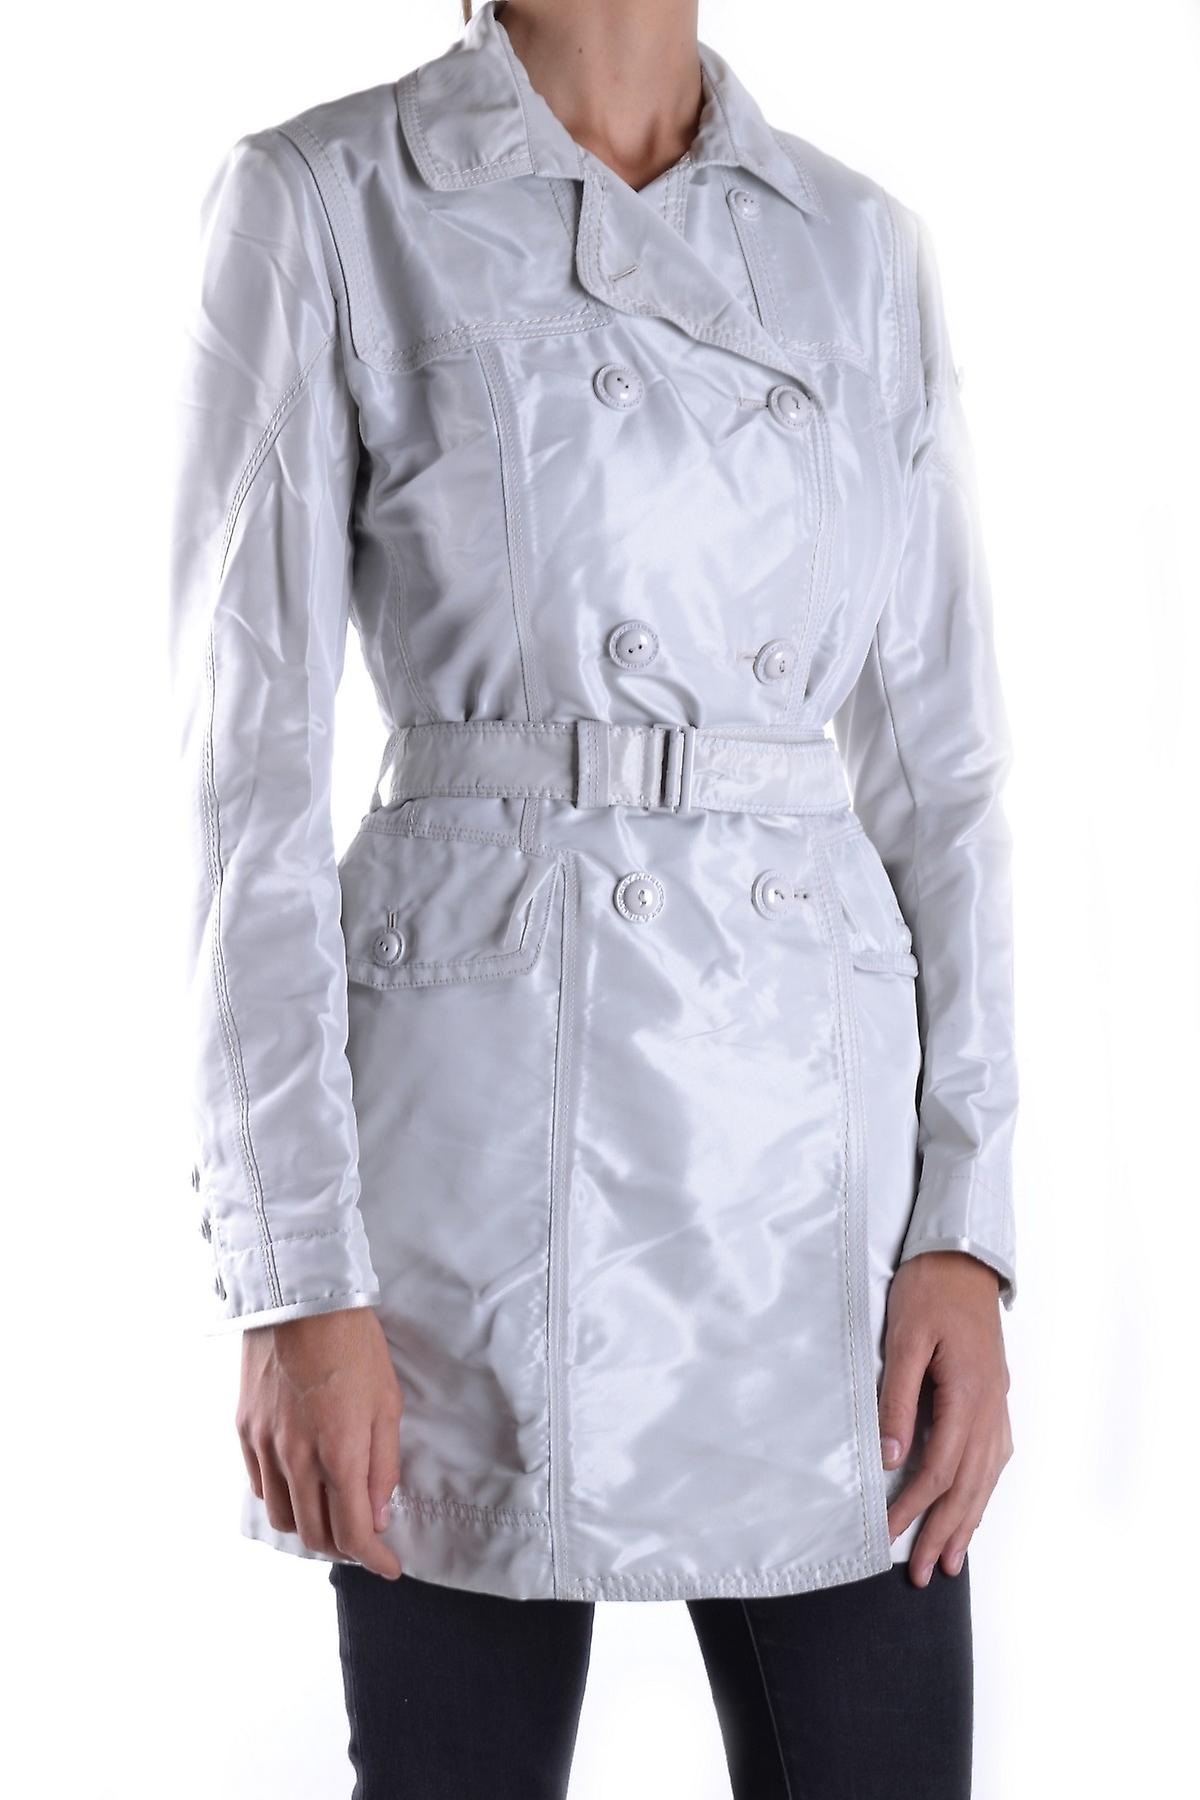 best sneakers 0c2bf 124ac Peuterey White Nylon Trench Coat